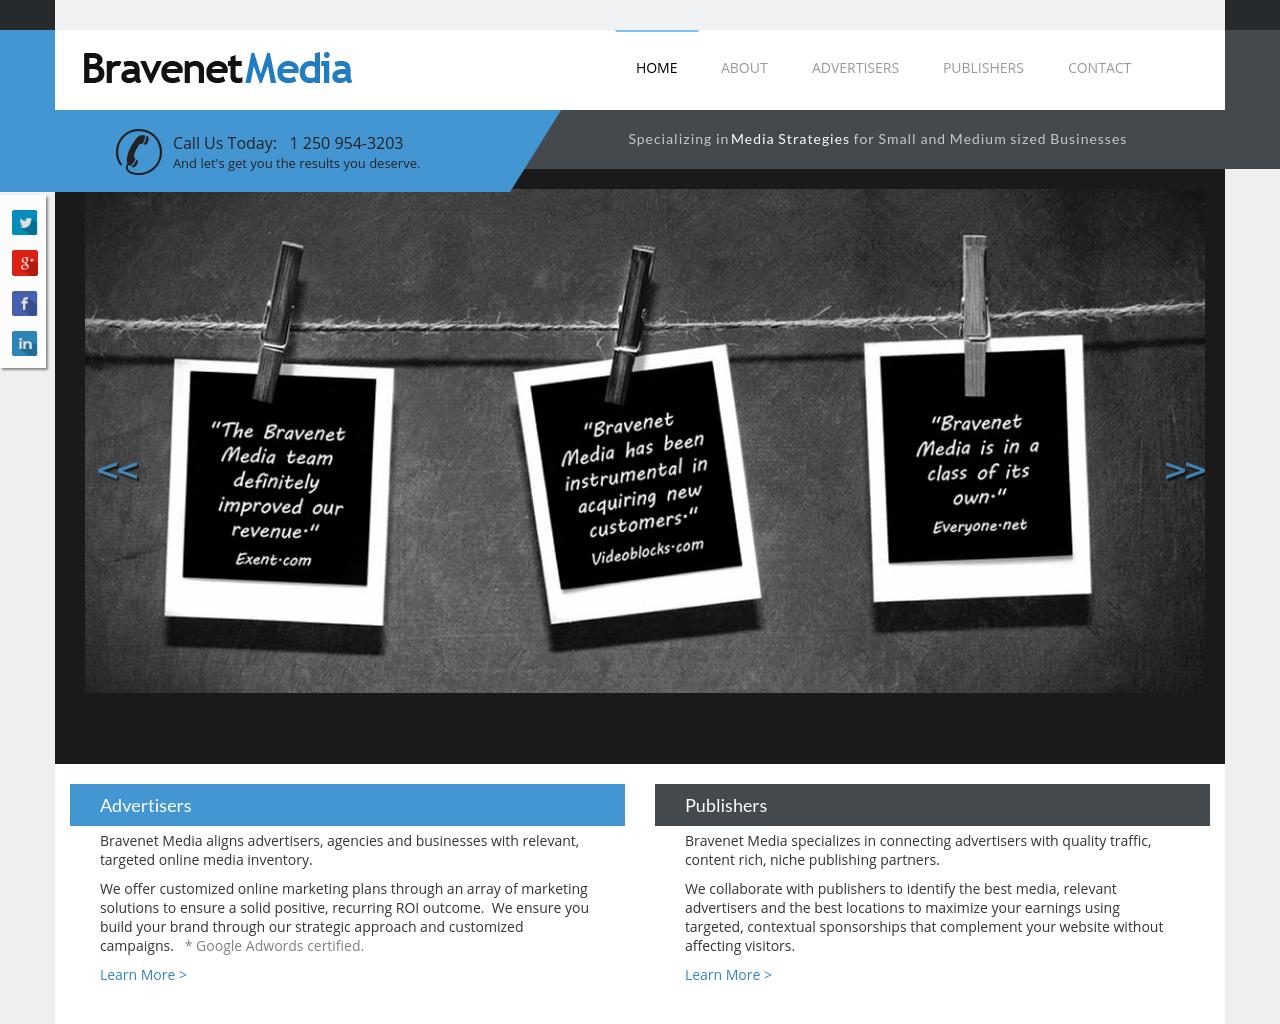 BravenetMedia-Advertising-Reviews-Pricing